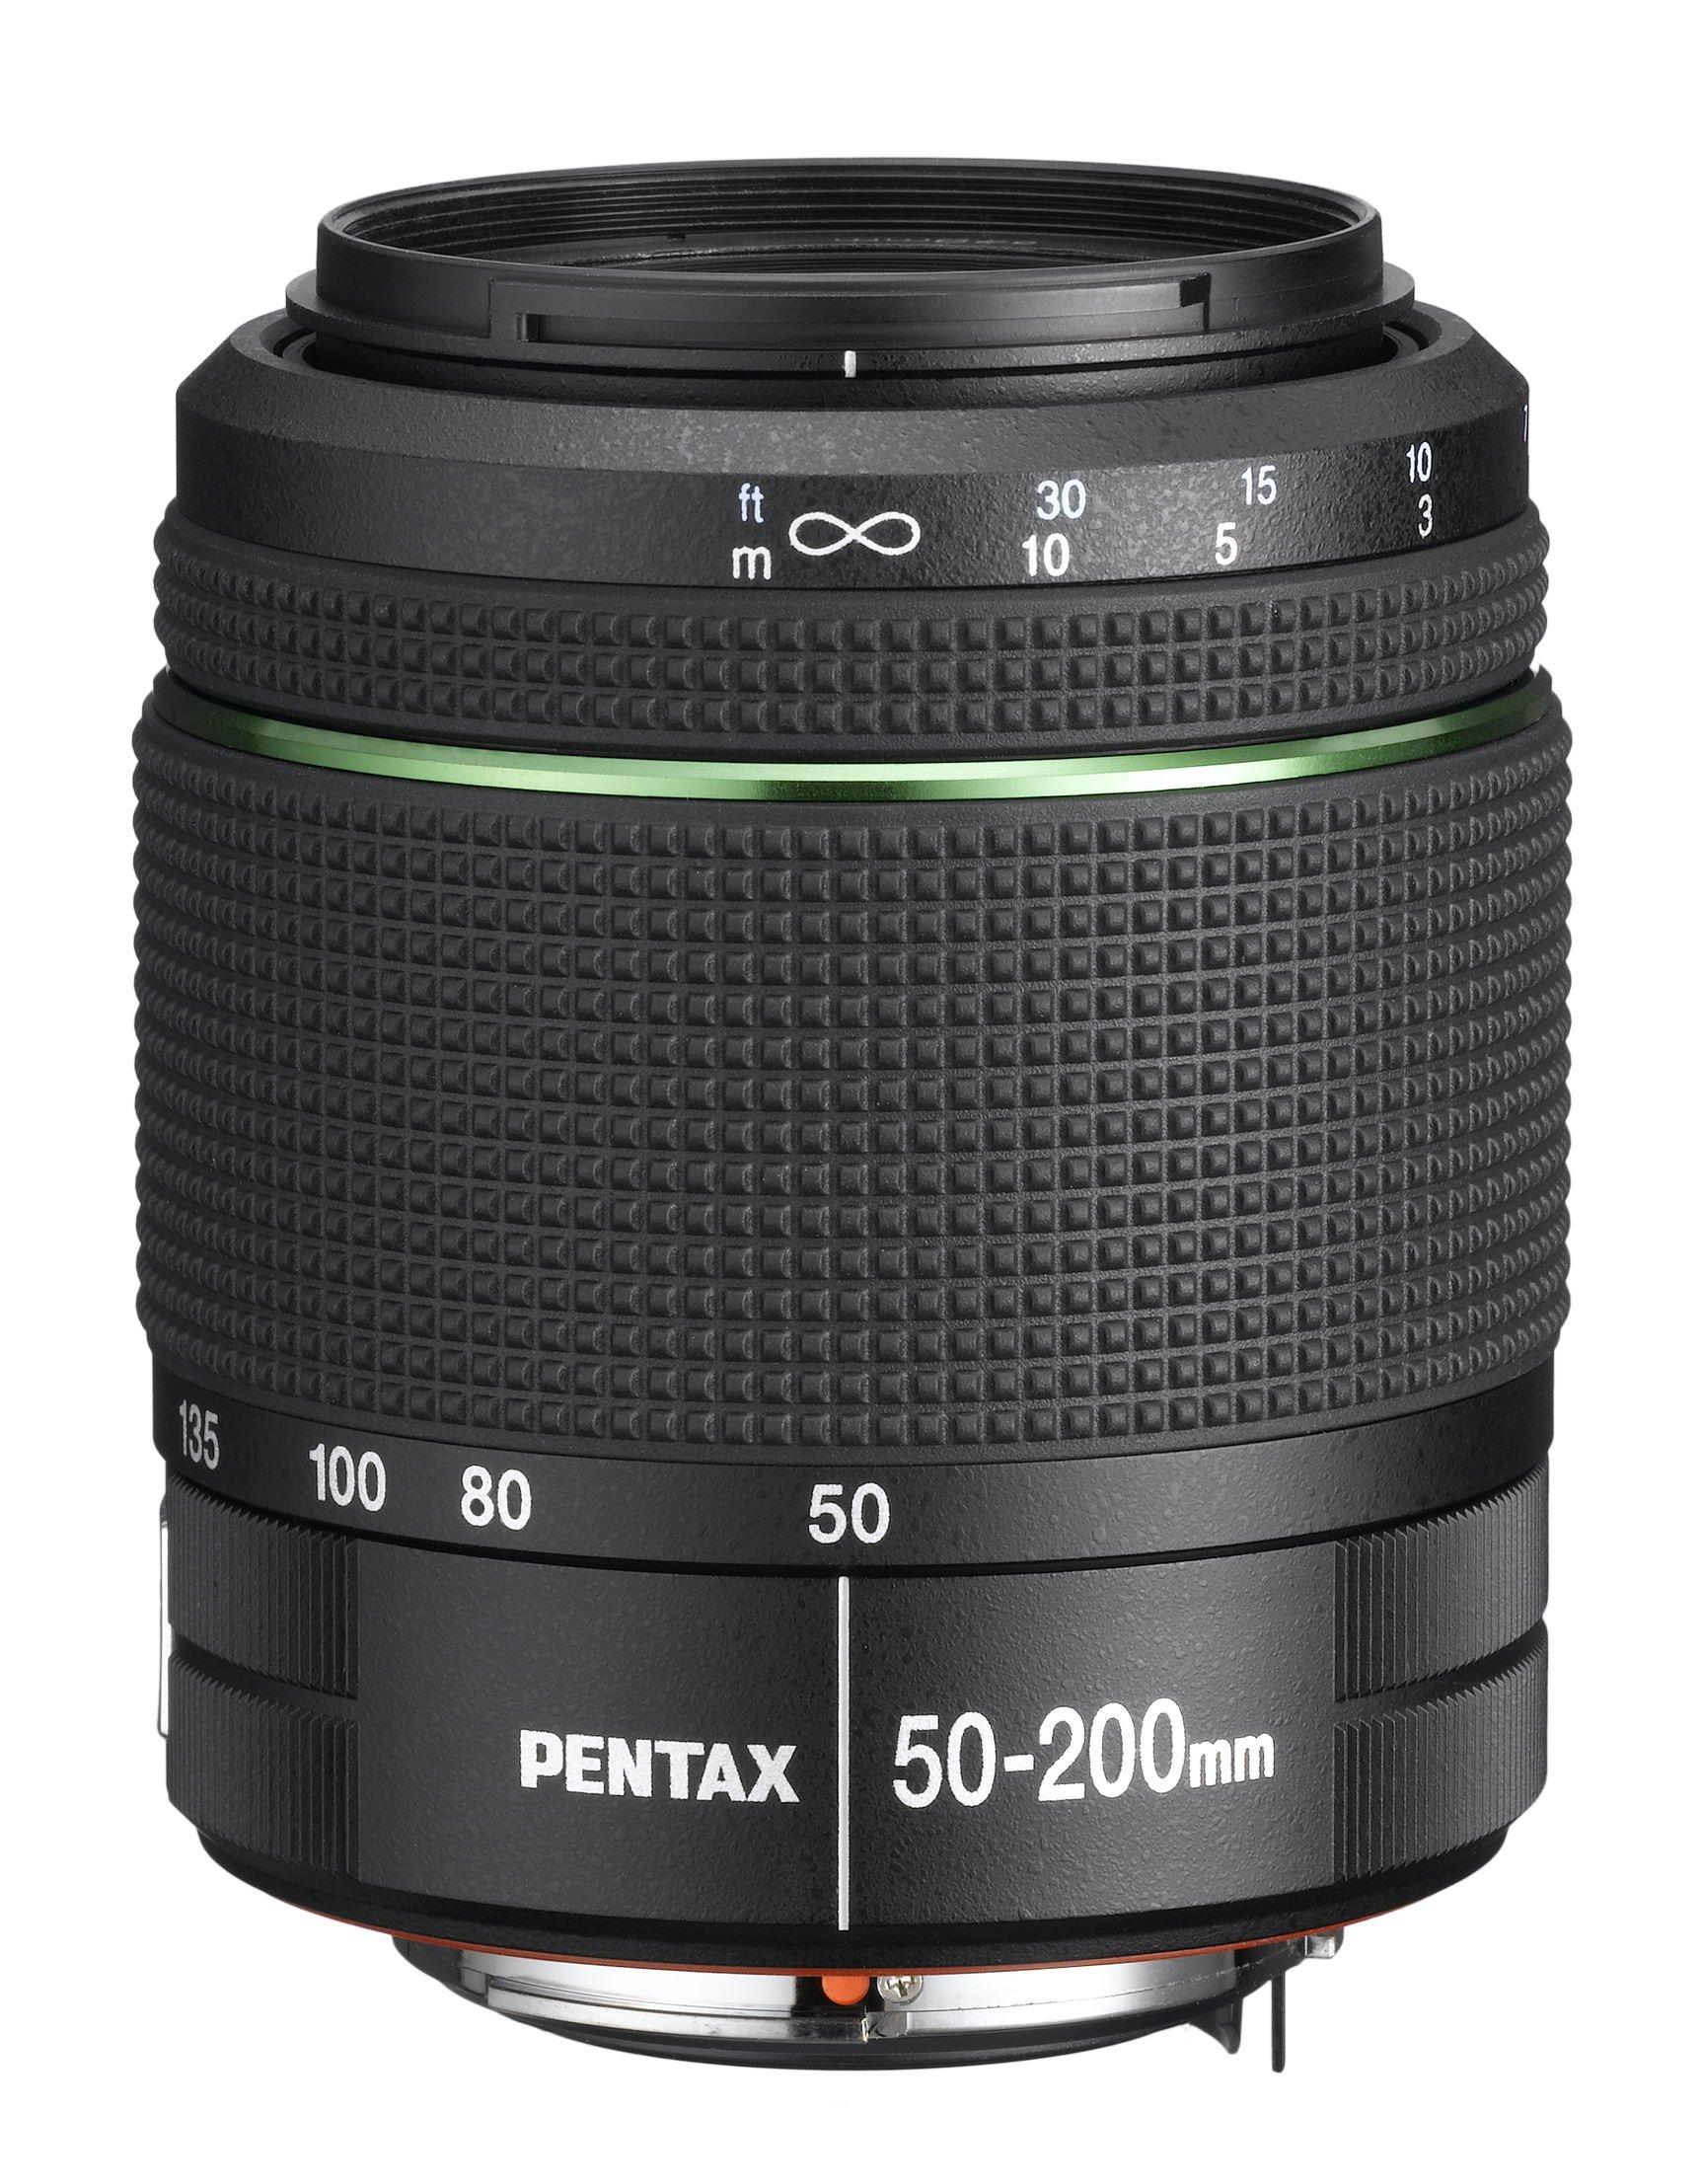 Pentax 50-200 mm f/4.0-5.6 SMC ED WR: Amazon.es: Electrónica